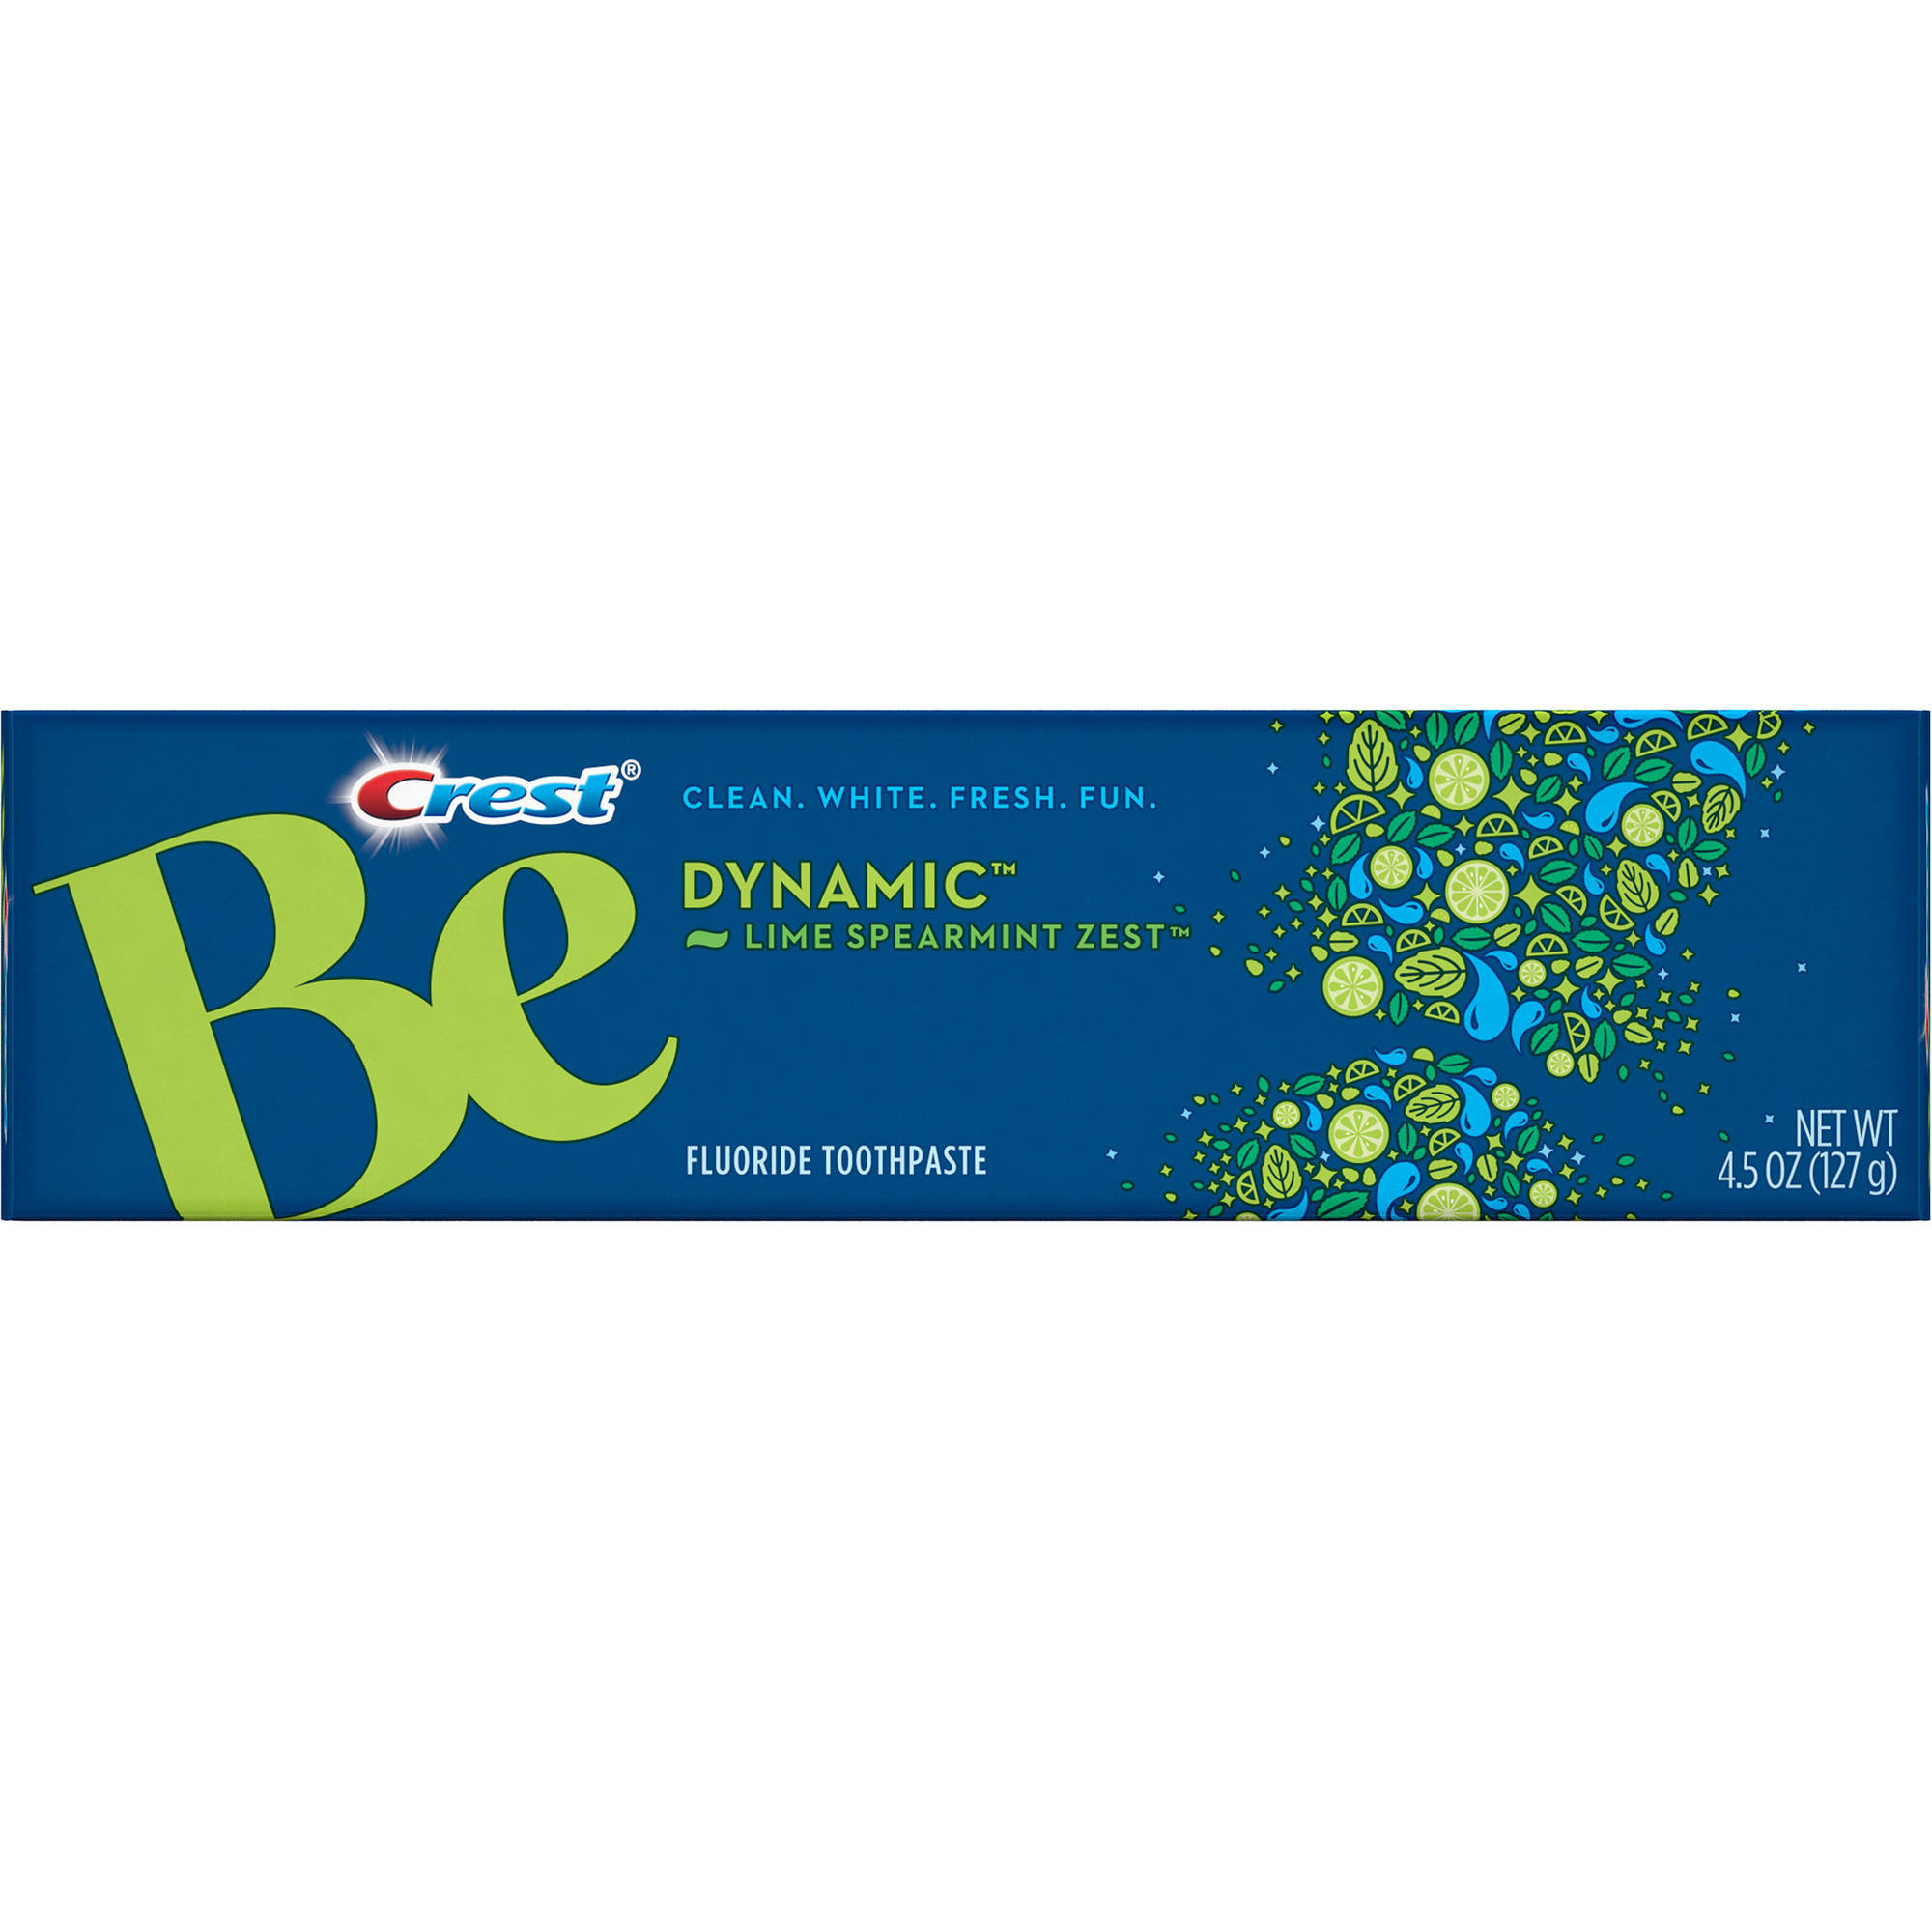 Crest Be Dynamic Lime Spearmint Zest Flavor Toothpaste, 4.5 oz